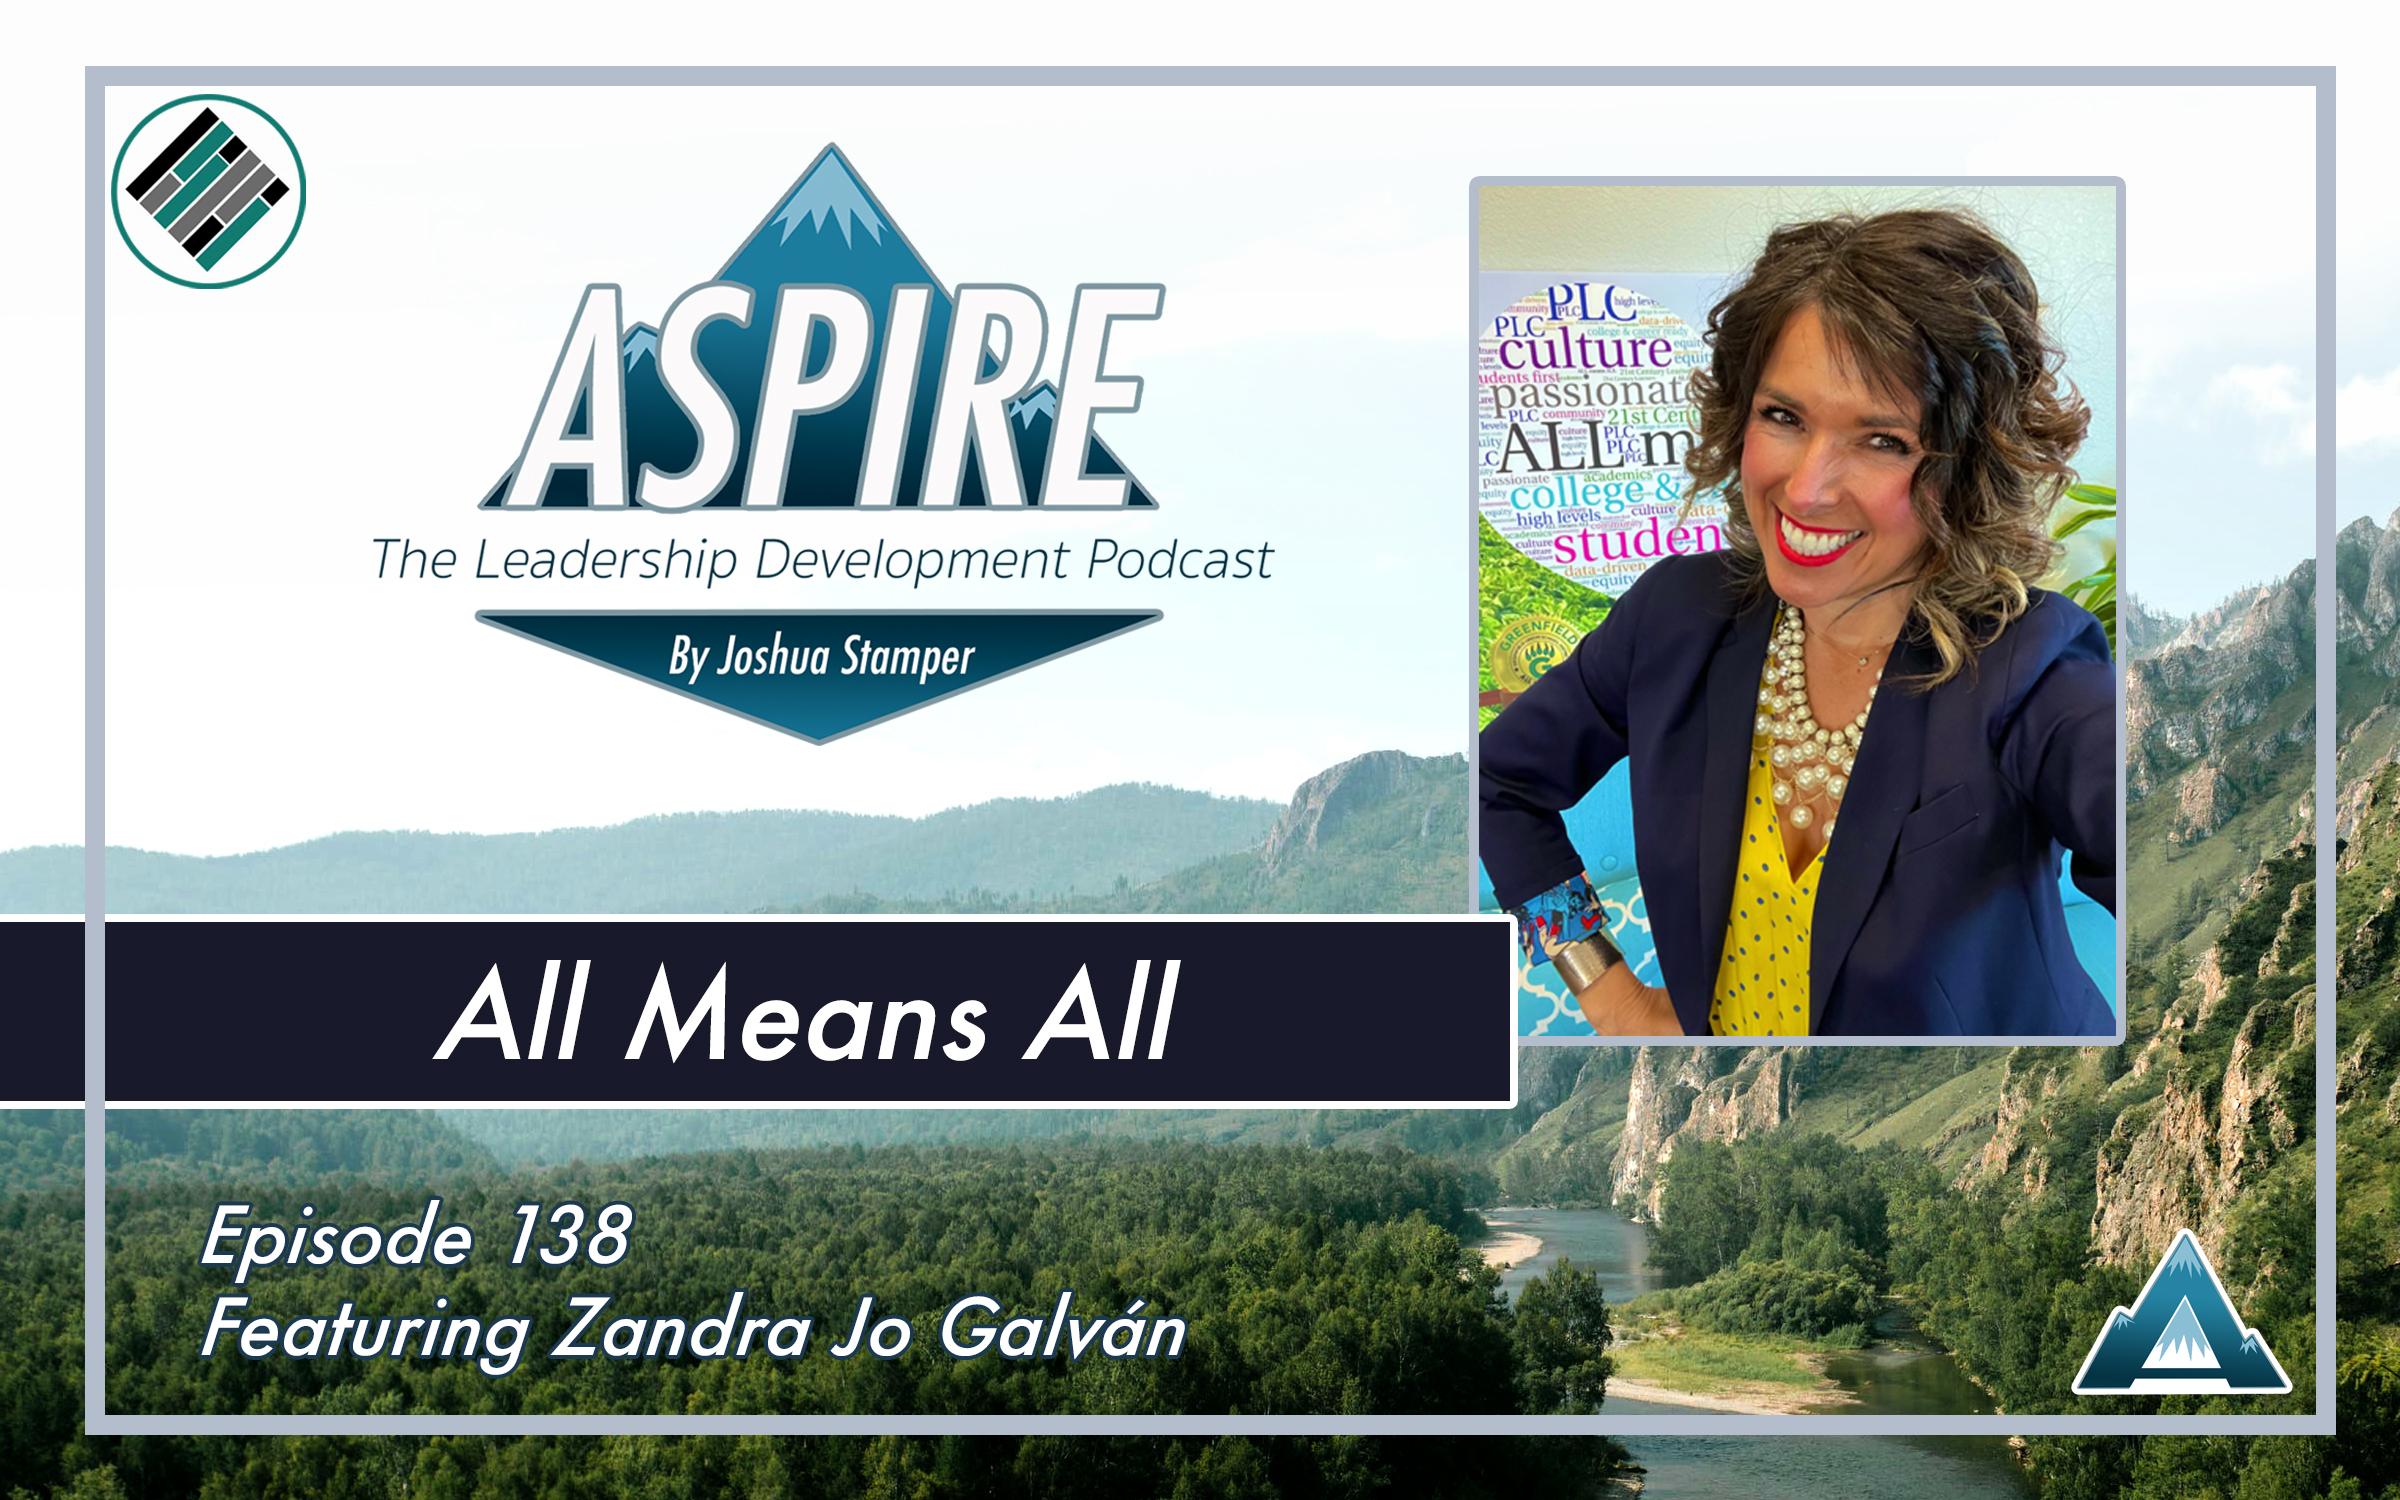 Joshua Stamper, Zandra Jo Galvan, Aspire: The Leadership Development Podcast, #AspireLead, Teach Better